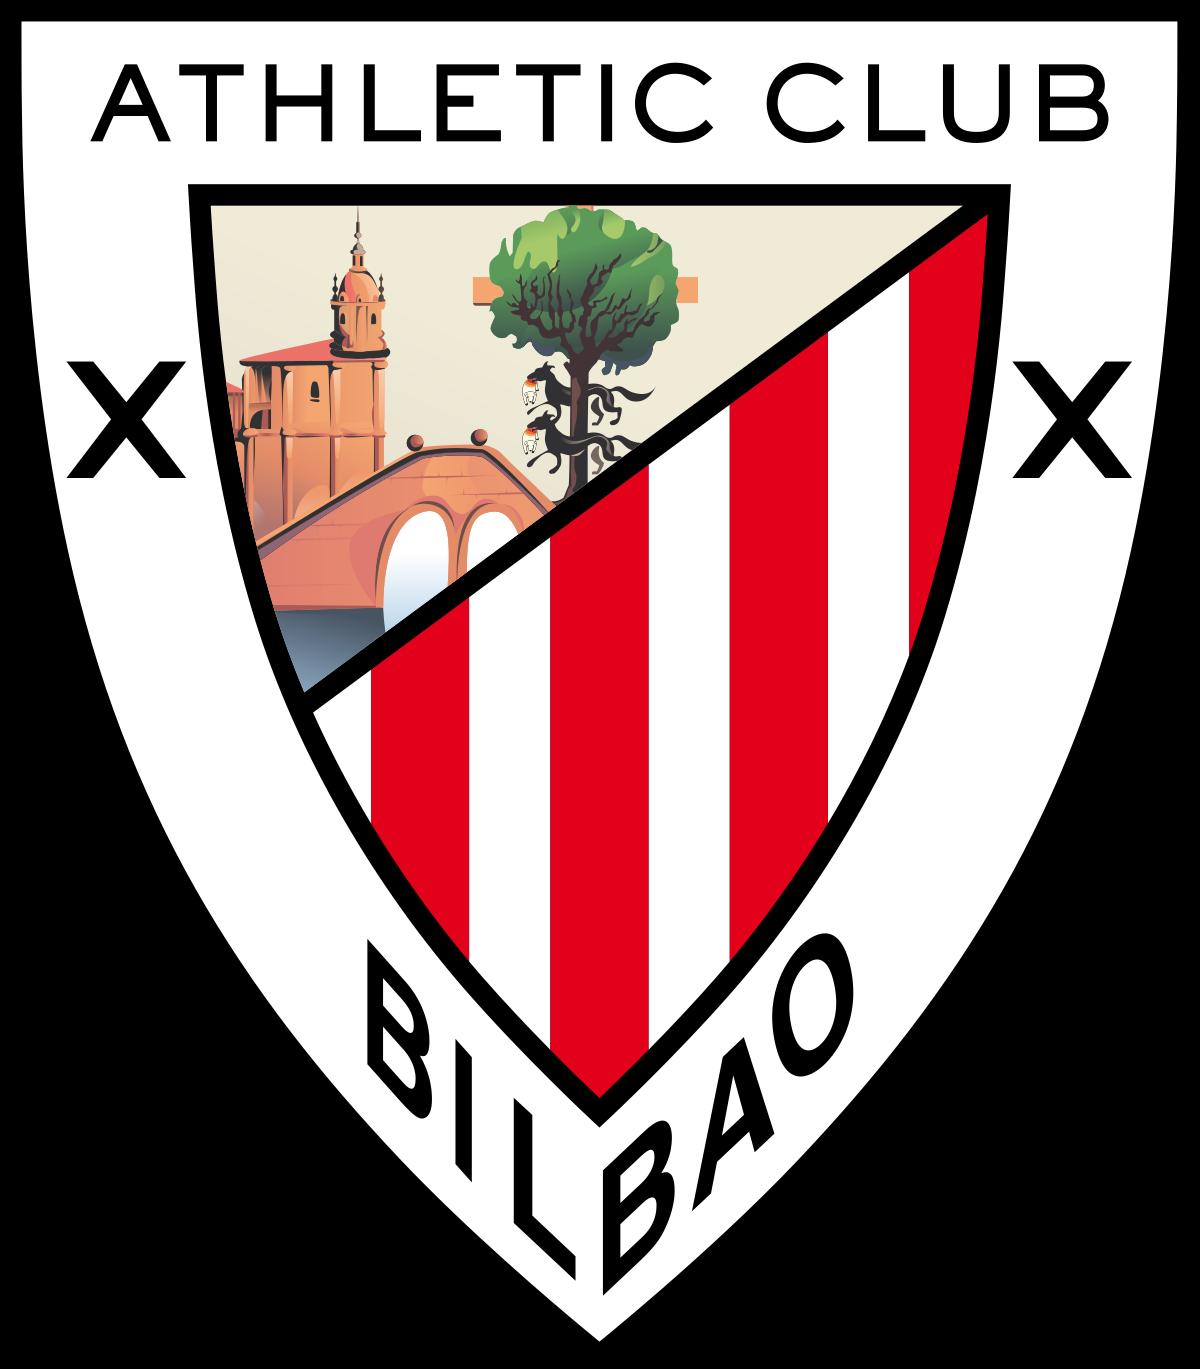 Емблема ФК «Атлетик Більбао»